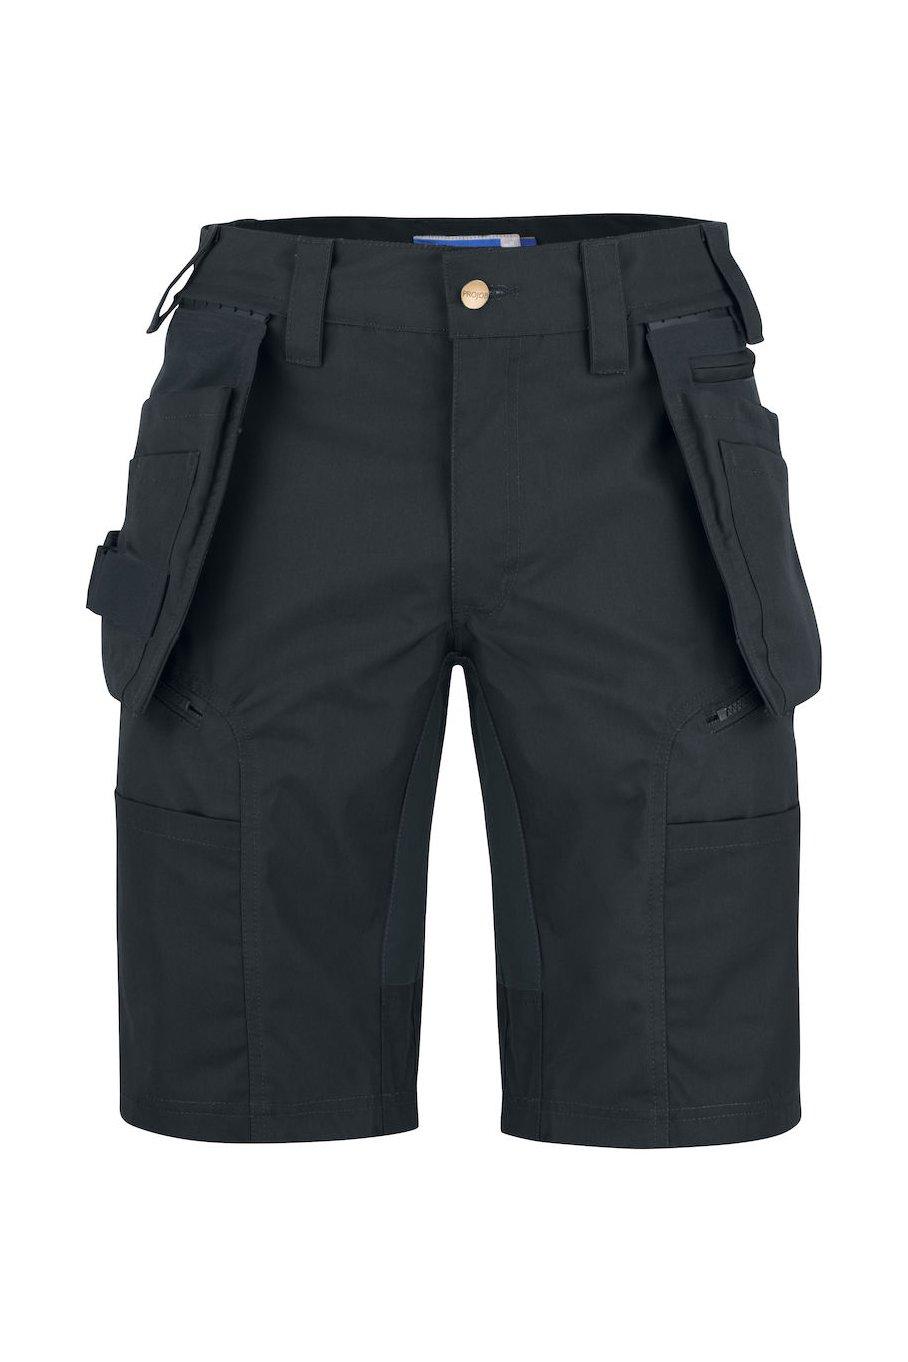 Funktionale Shorts, schwarz